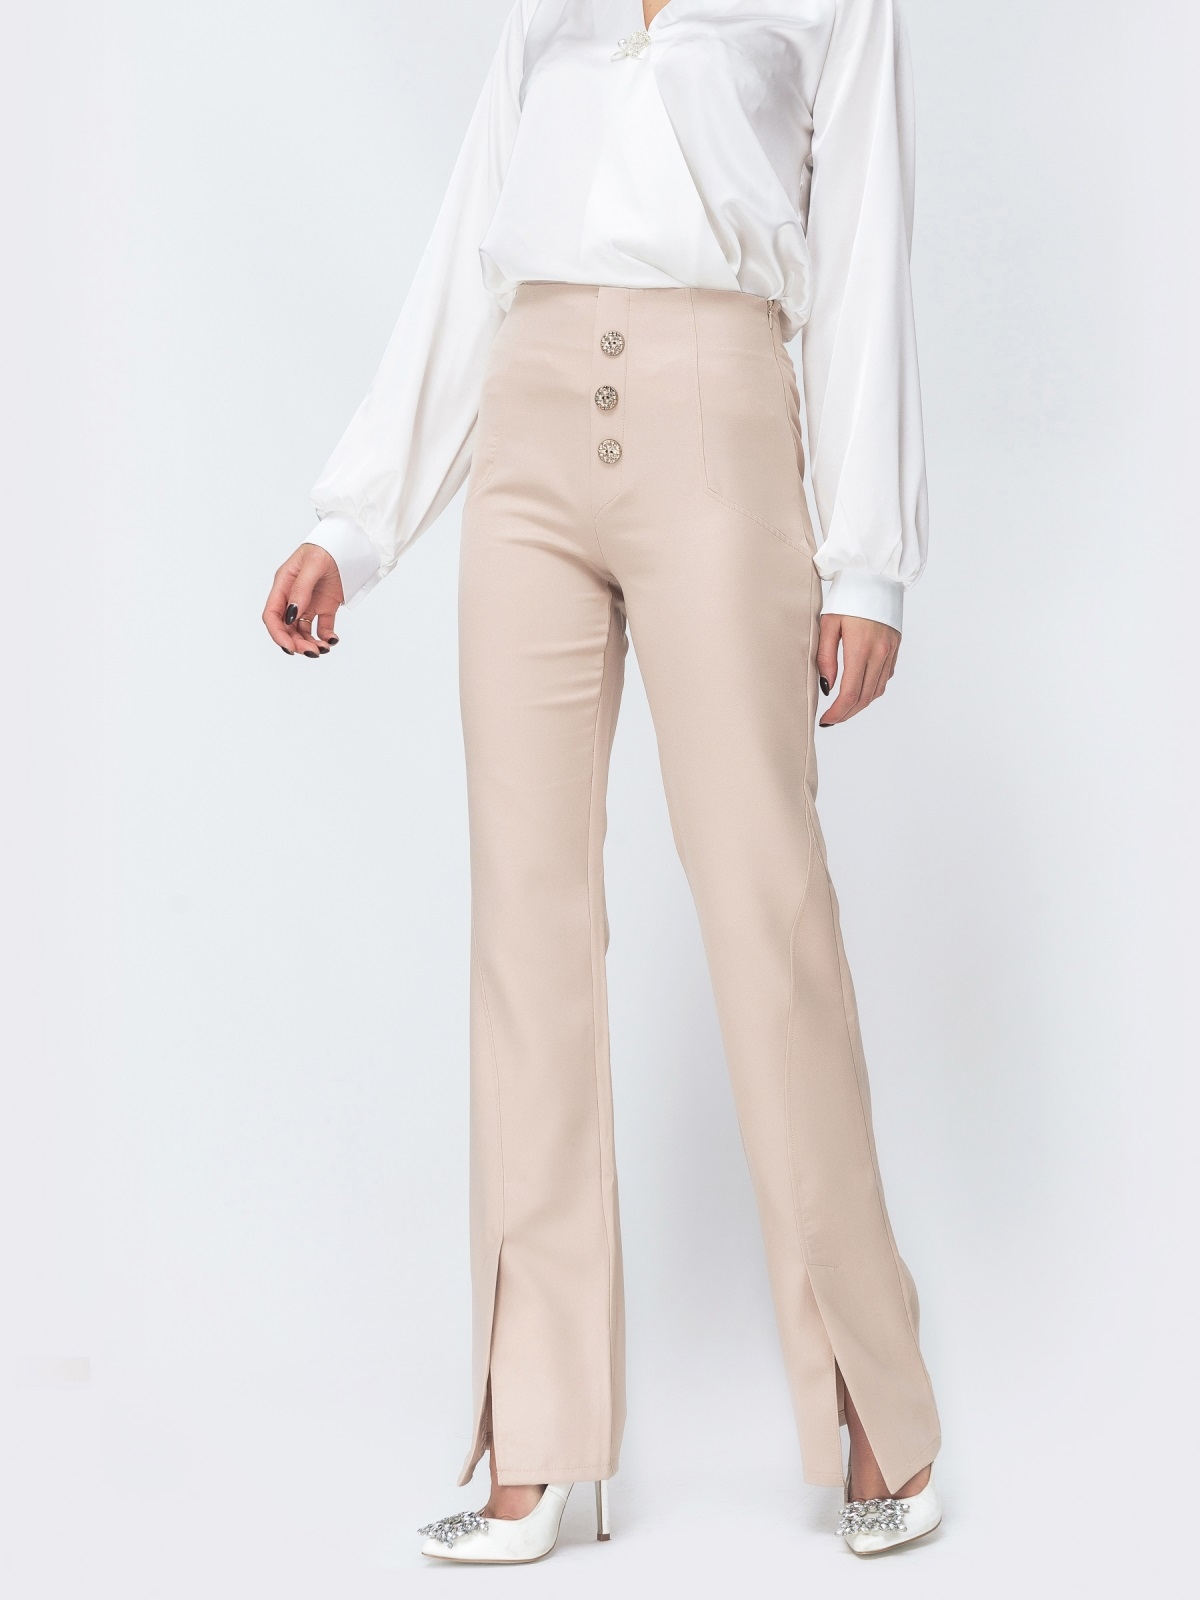 Бежевые брюки-клёш с разрезами по низу - 44118, фото 1 – интернет-магазин Dressa